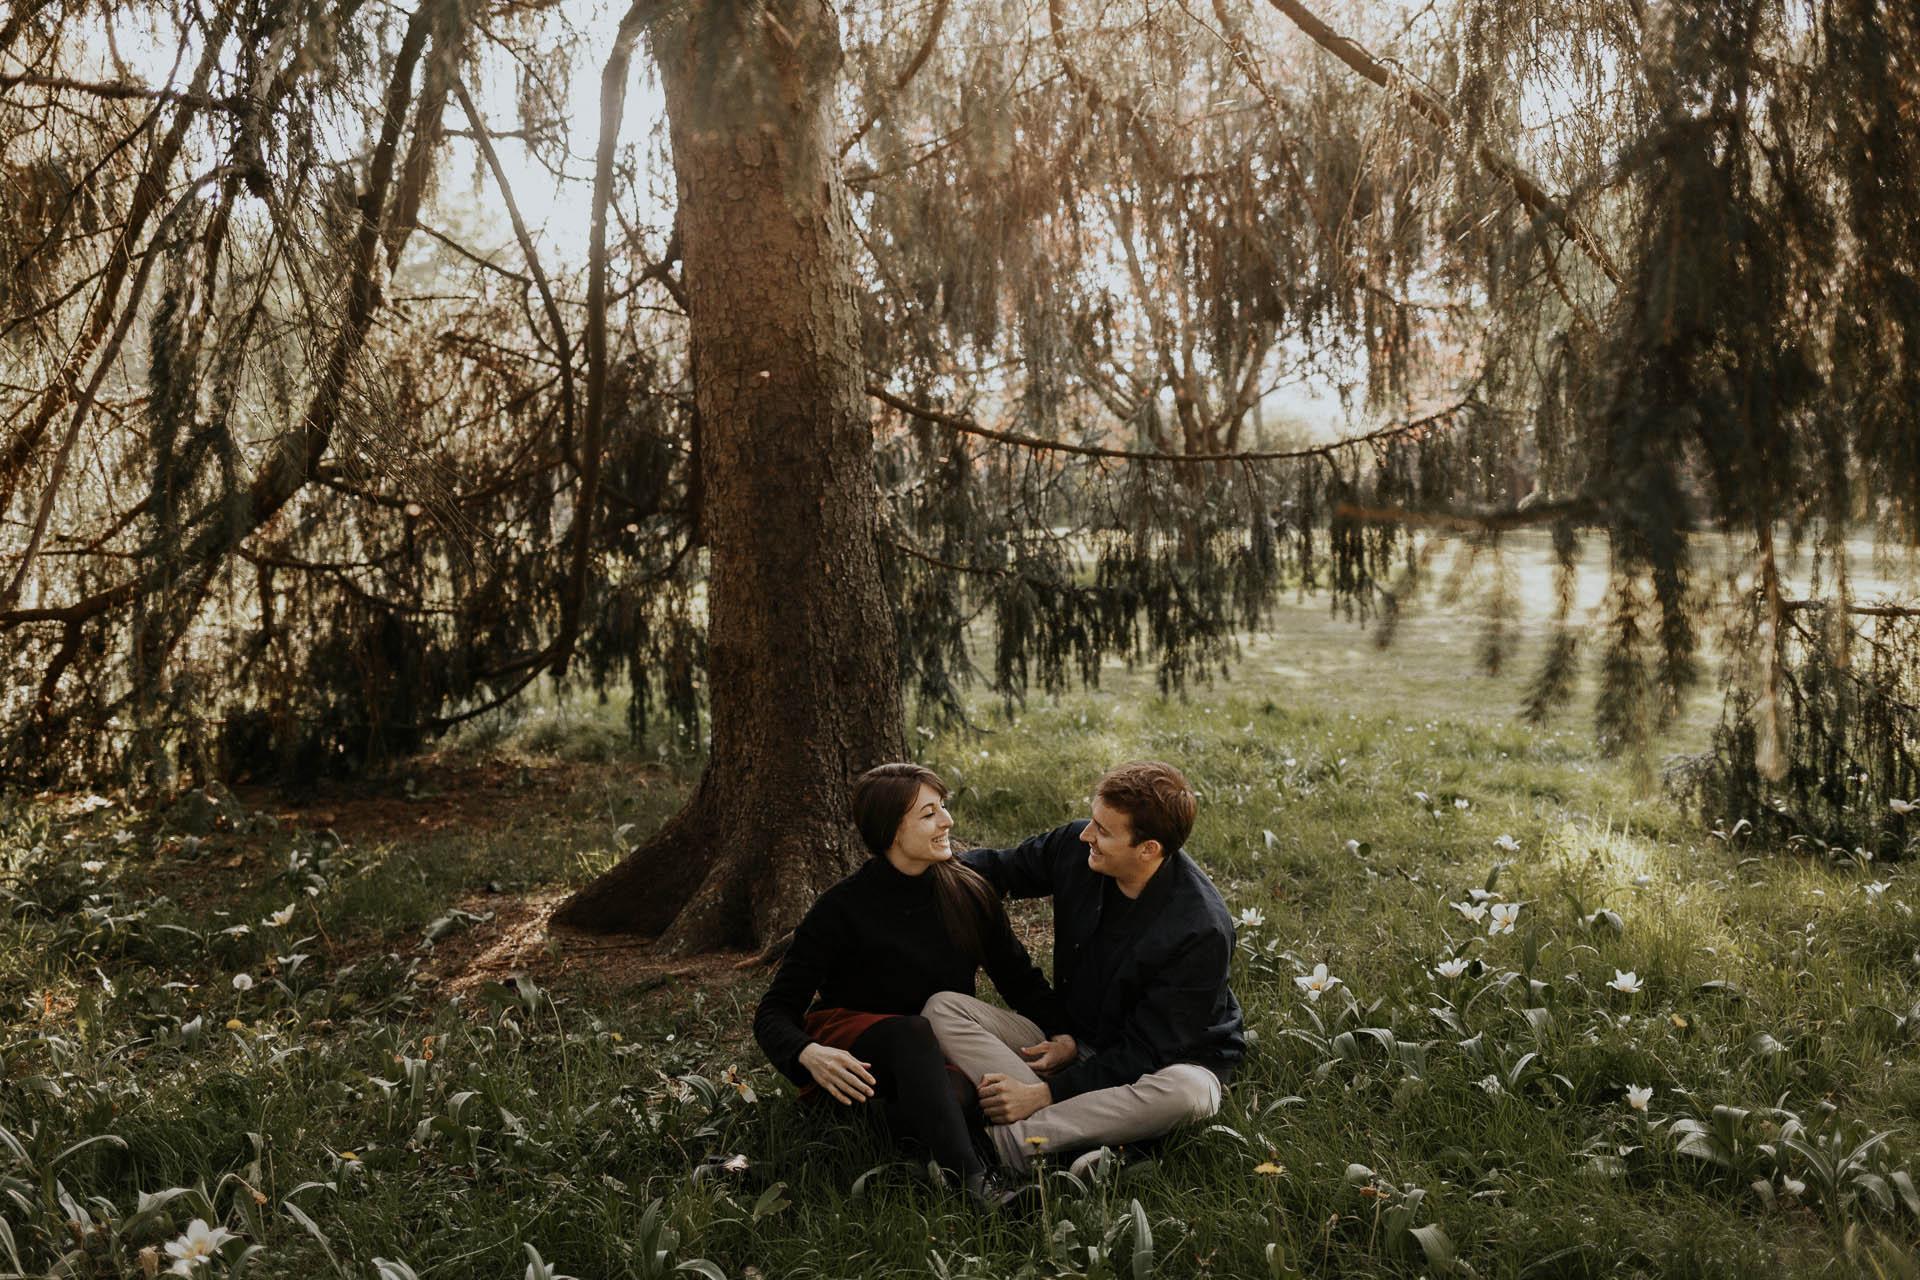 engagement_session_nantes_parc_flavie_nelly_photographe_mariage-5